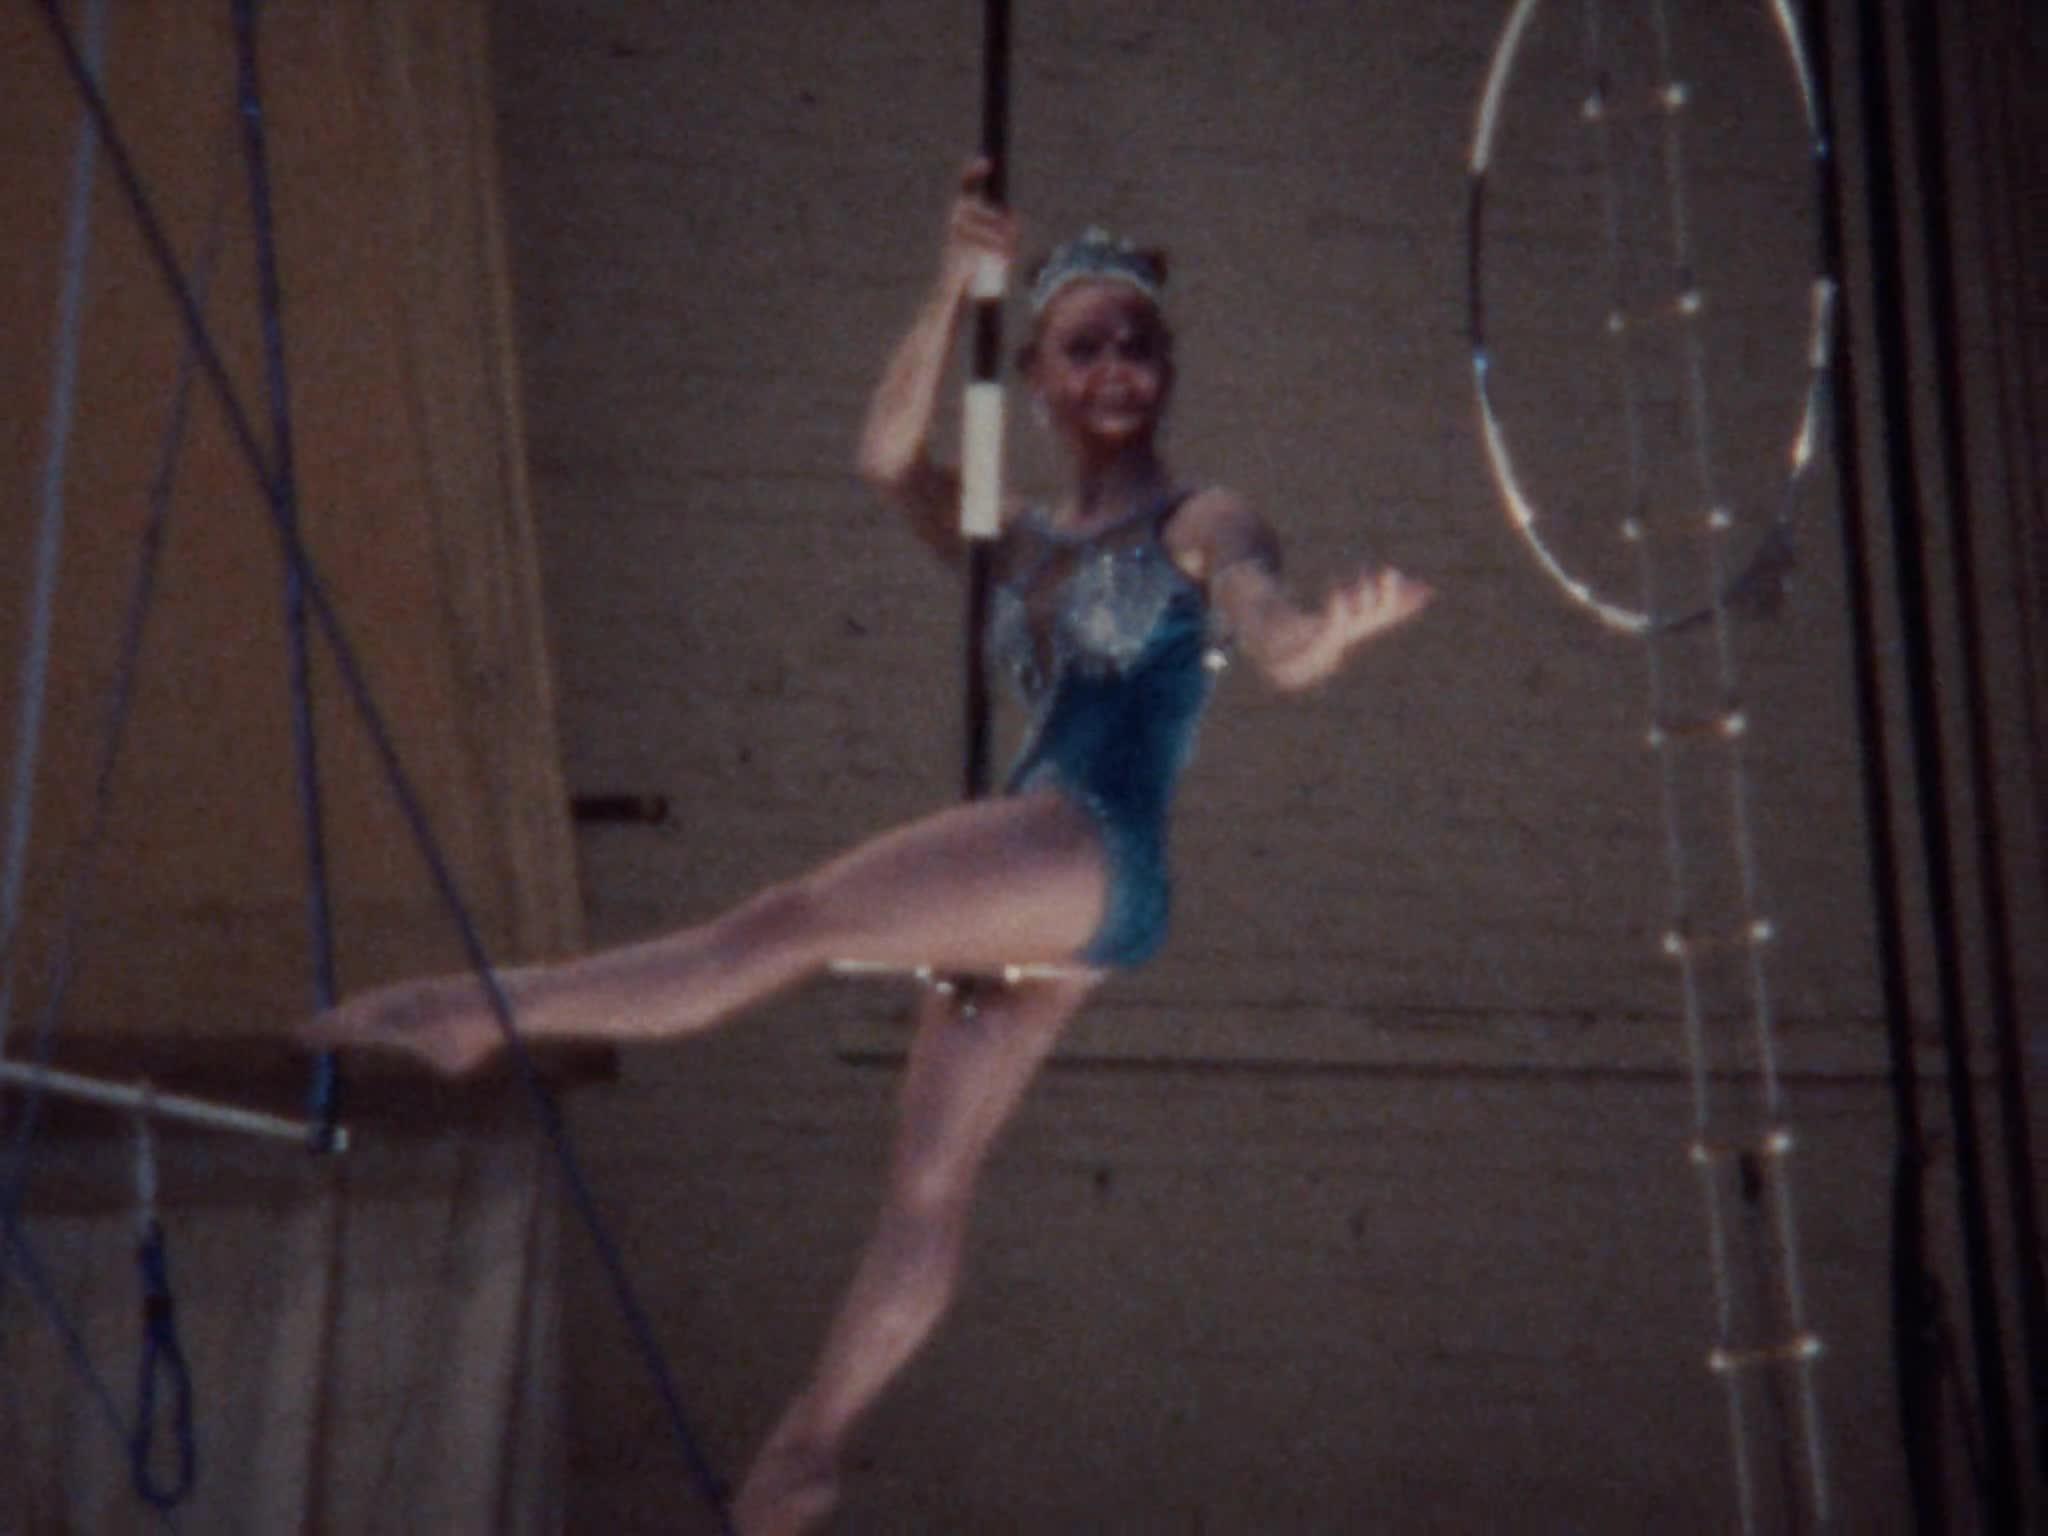 Aerial Perch Act, Aerial Head Balancing Act